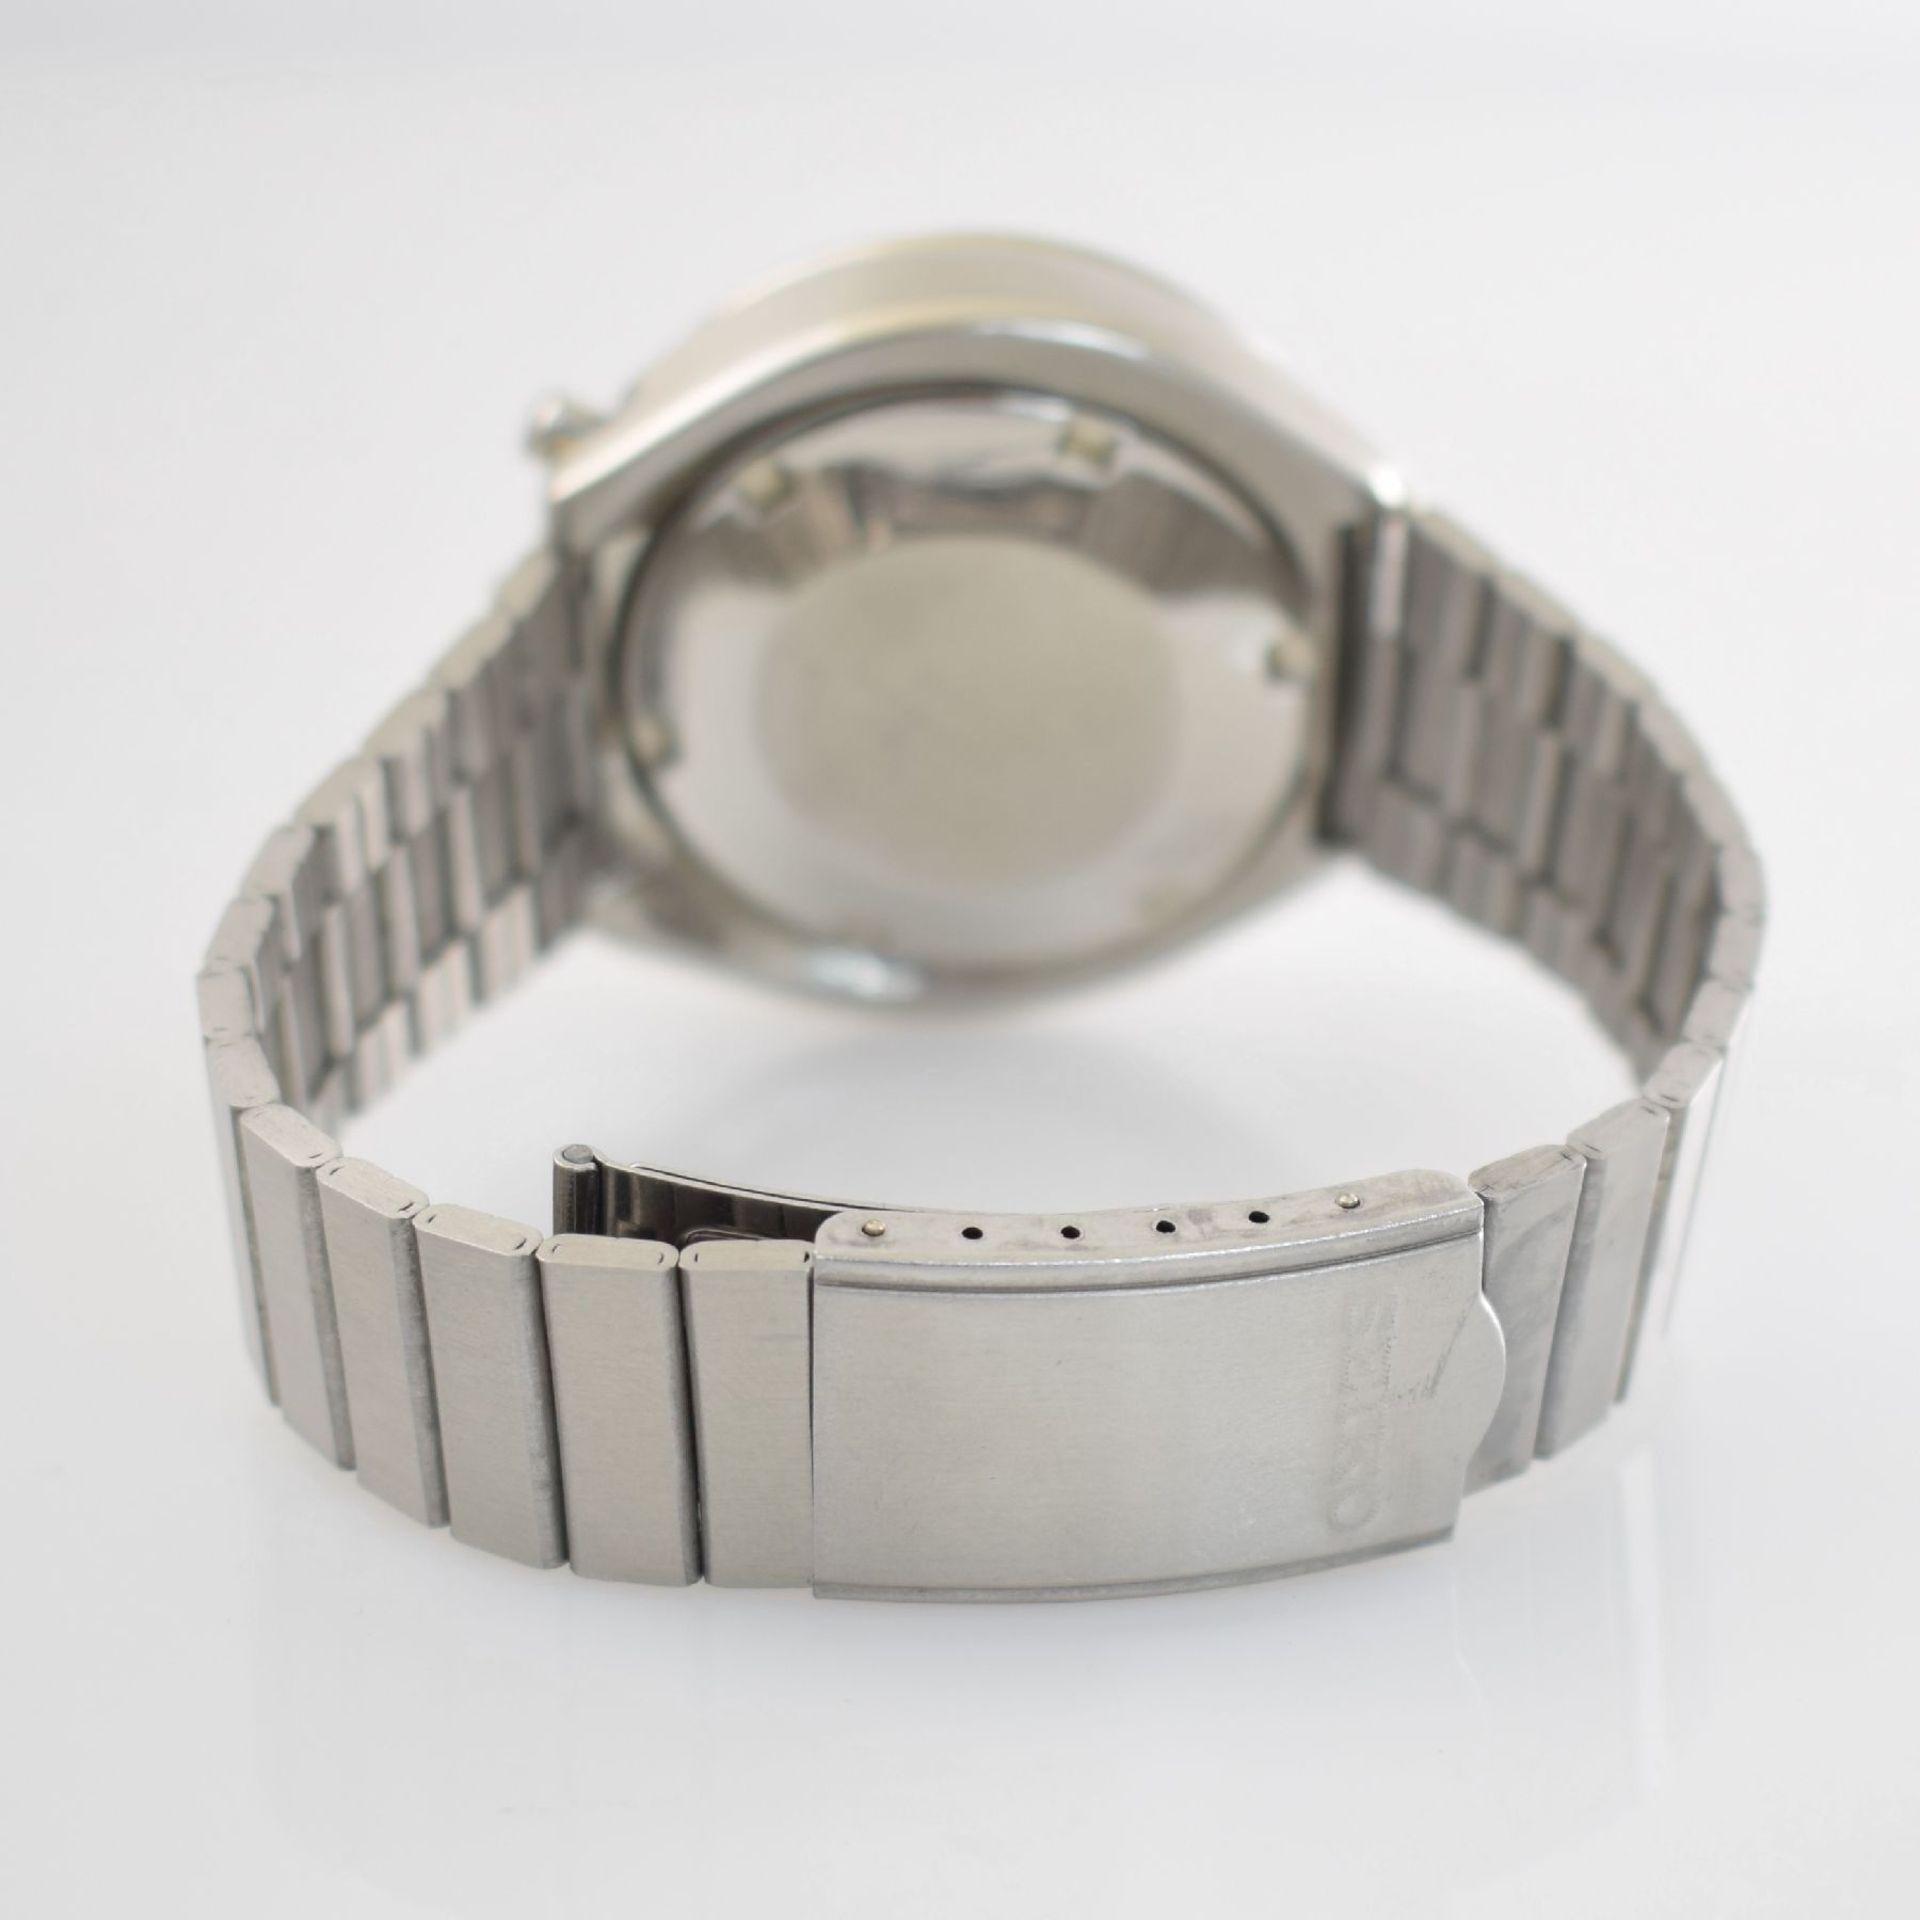 SEIKO sog. BULLHEAD Armbandchronograph, Japan um 1970, Automatik, Ref. 6138-0040, verschr. - Bild 7 aus 7